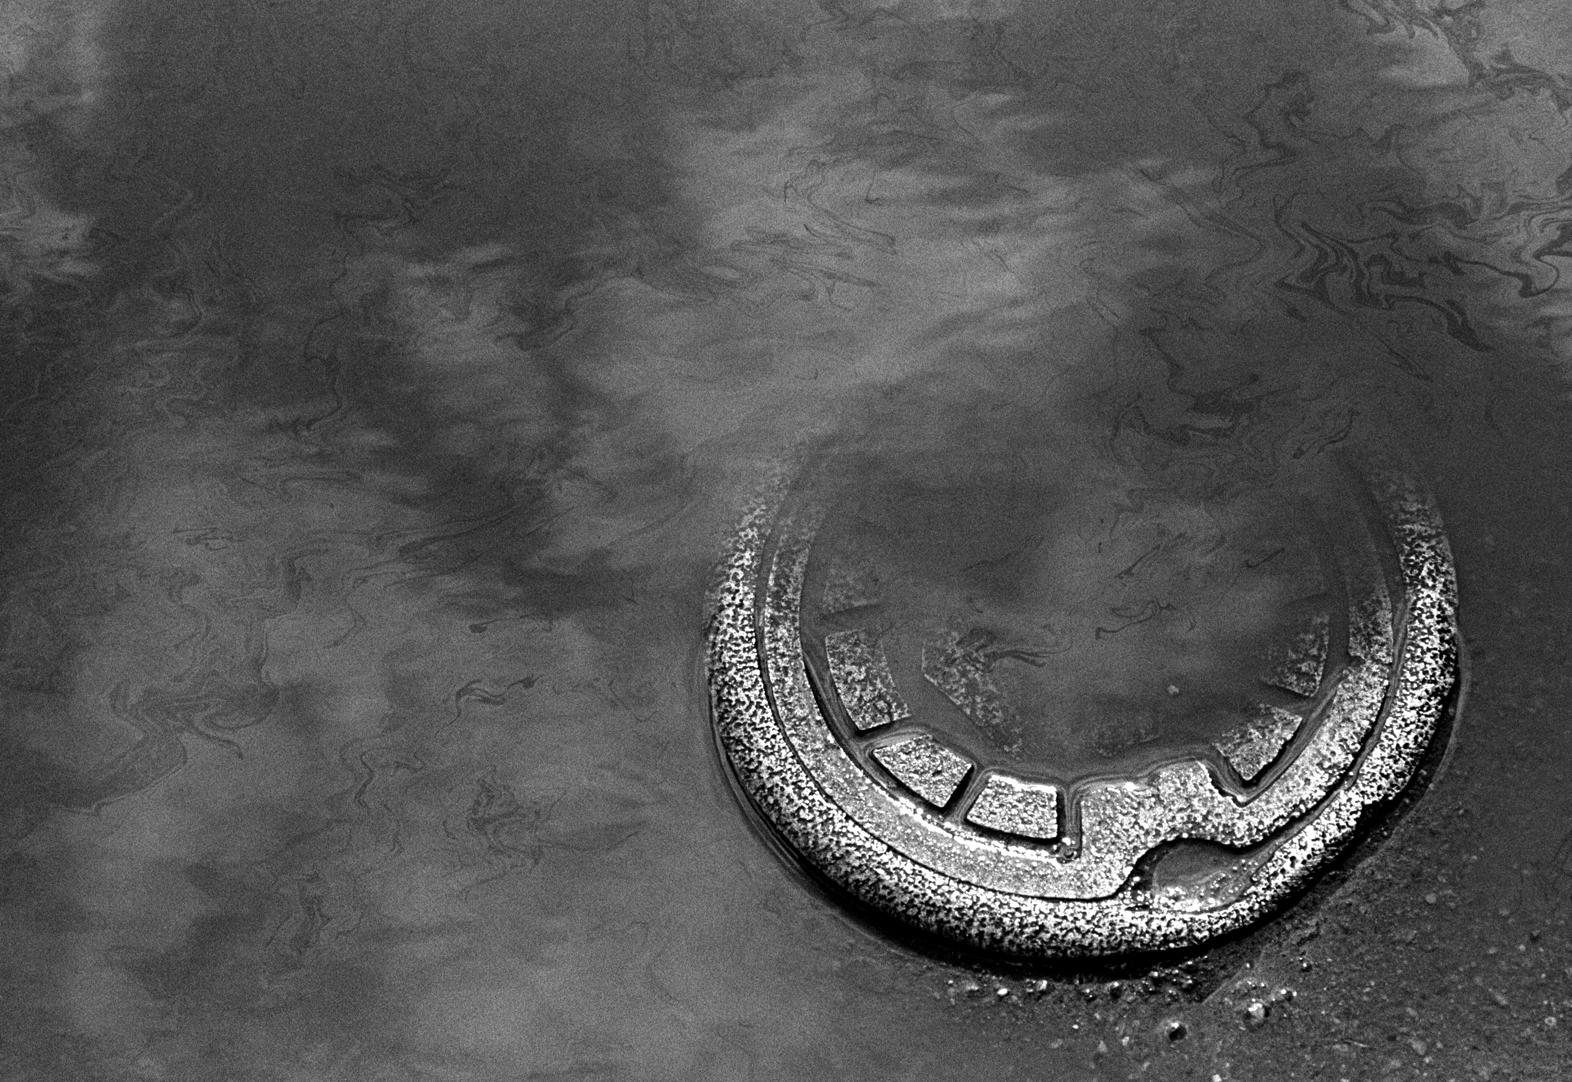 03-remnant-manhole UFO 72.jpg